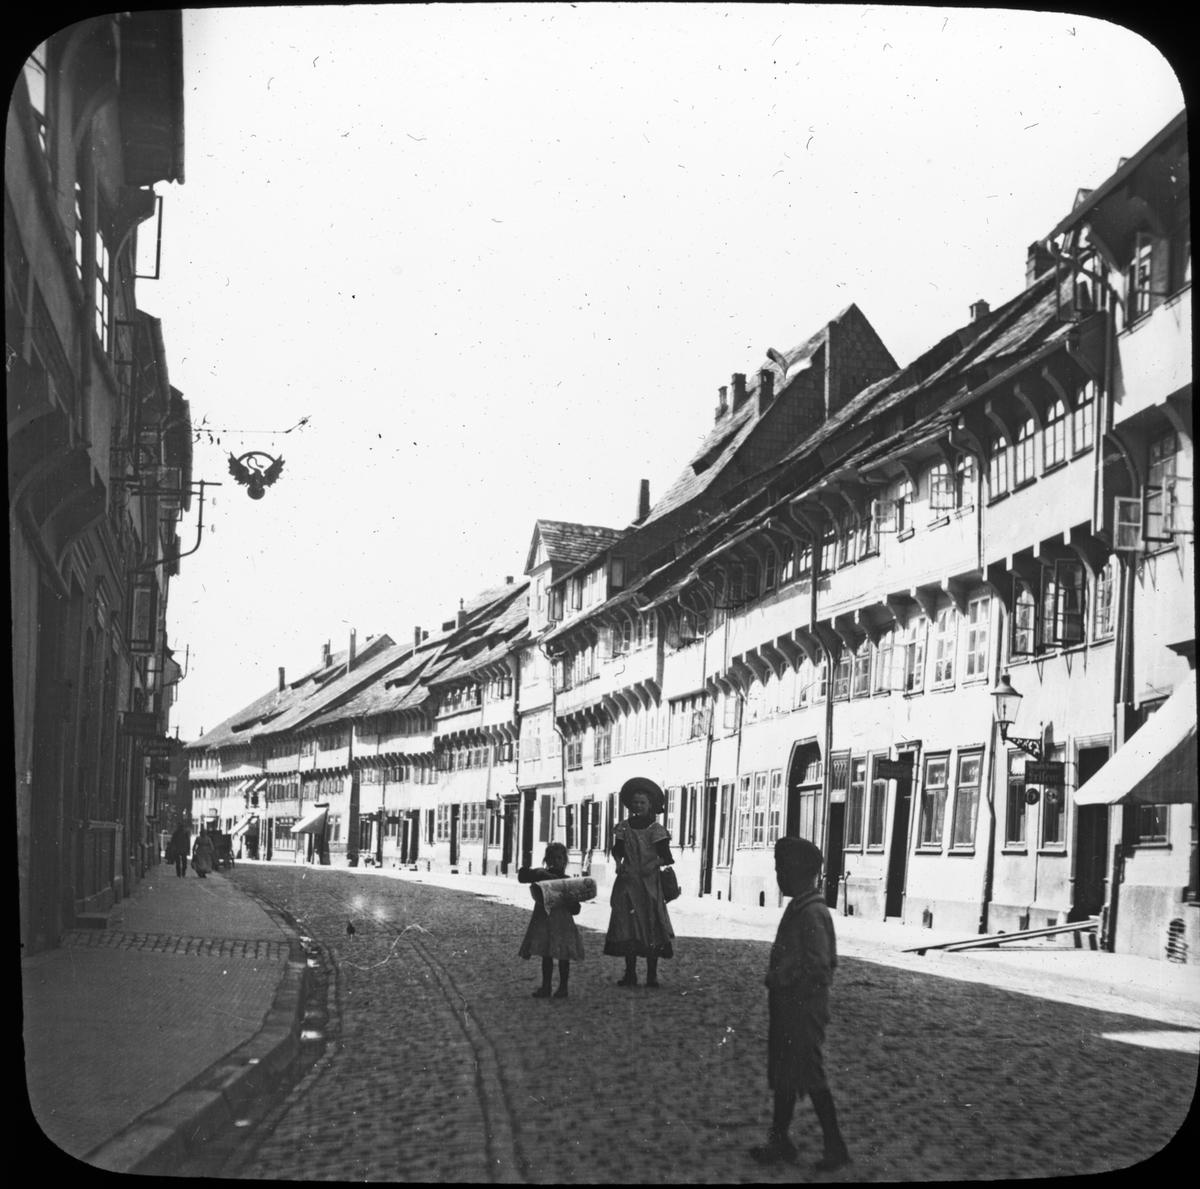 Skioptikonbild med motiv barn på gata i Einbeck. Bilden har förvarats i kartong märkt: Vårresan 1909. Hildensheim 4. Einbeck 5. VII